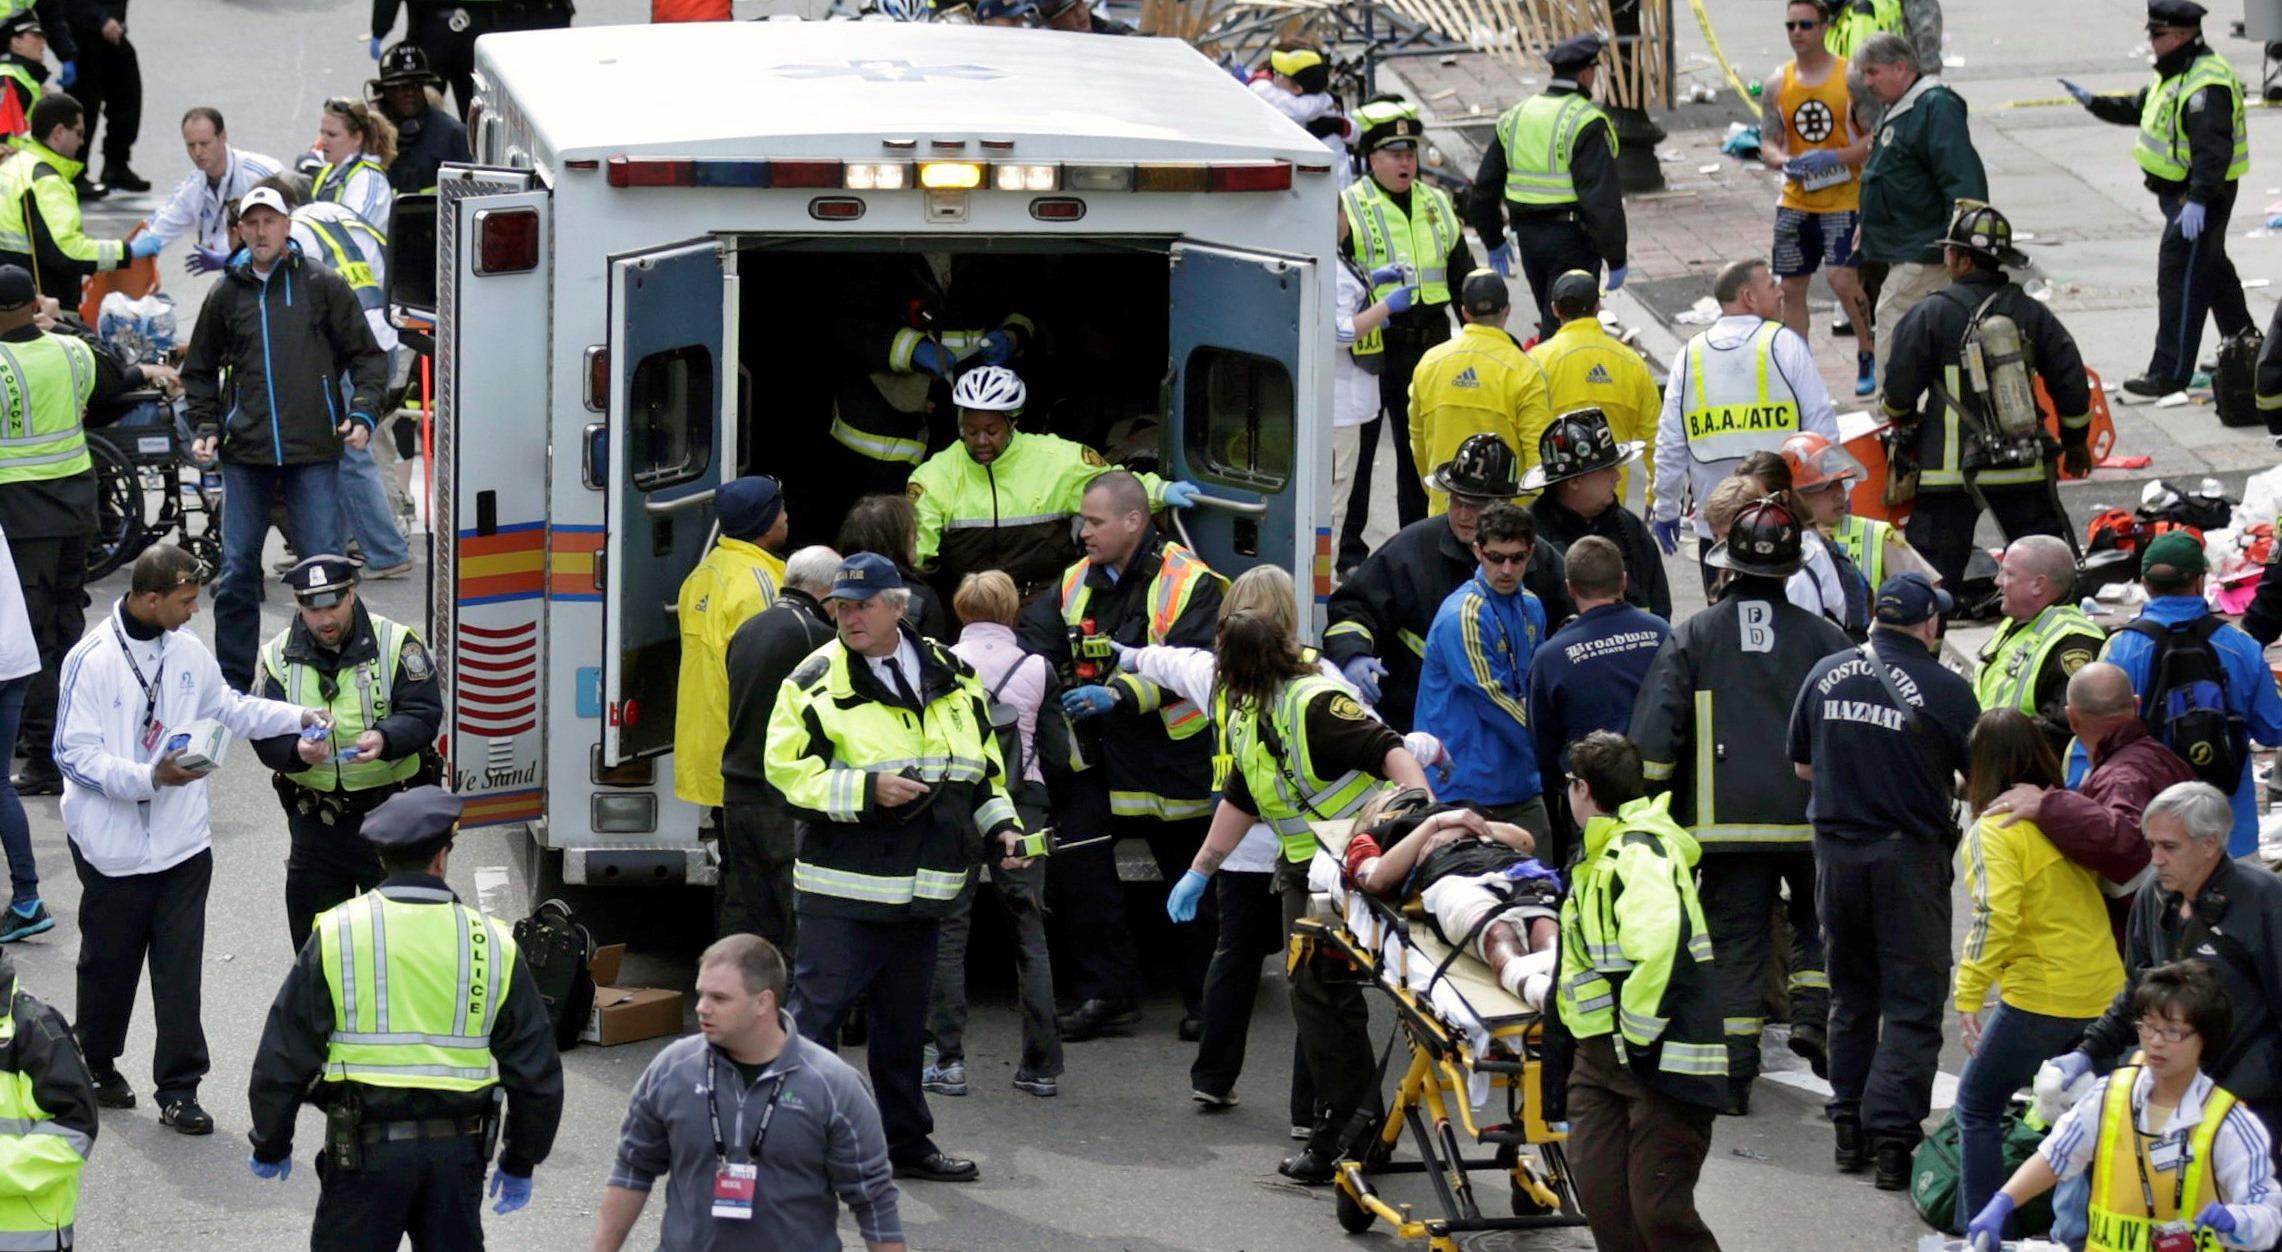 Boston marathon bombing EMTs treating injured